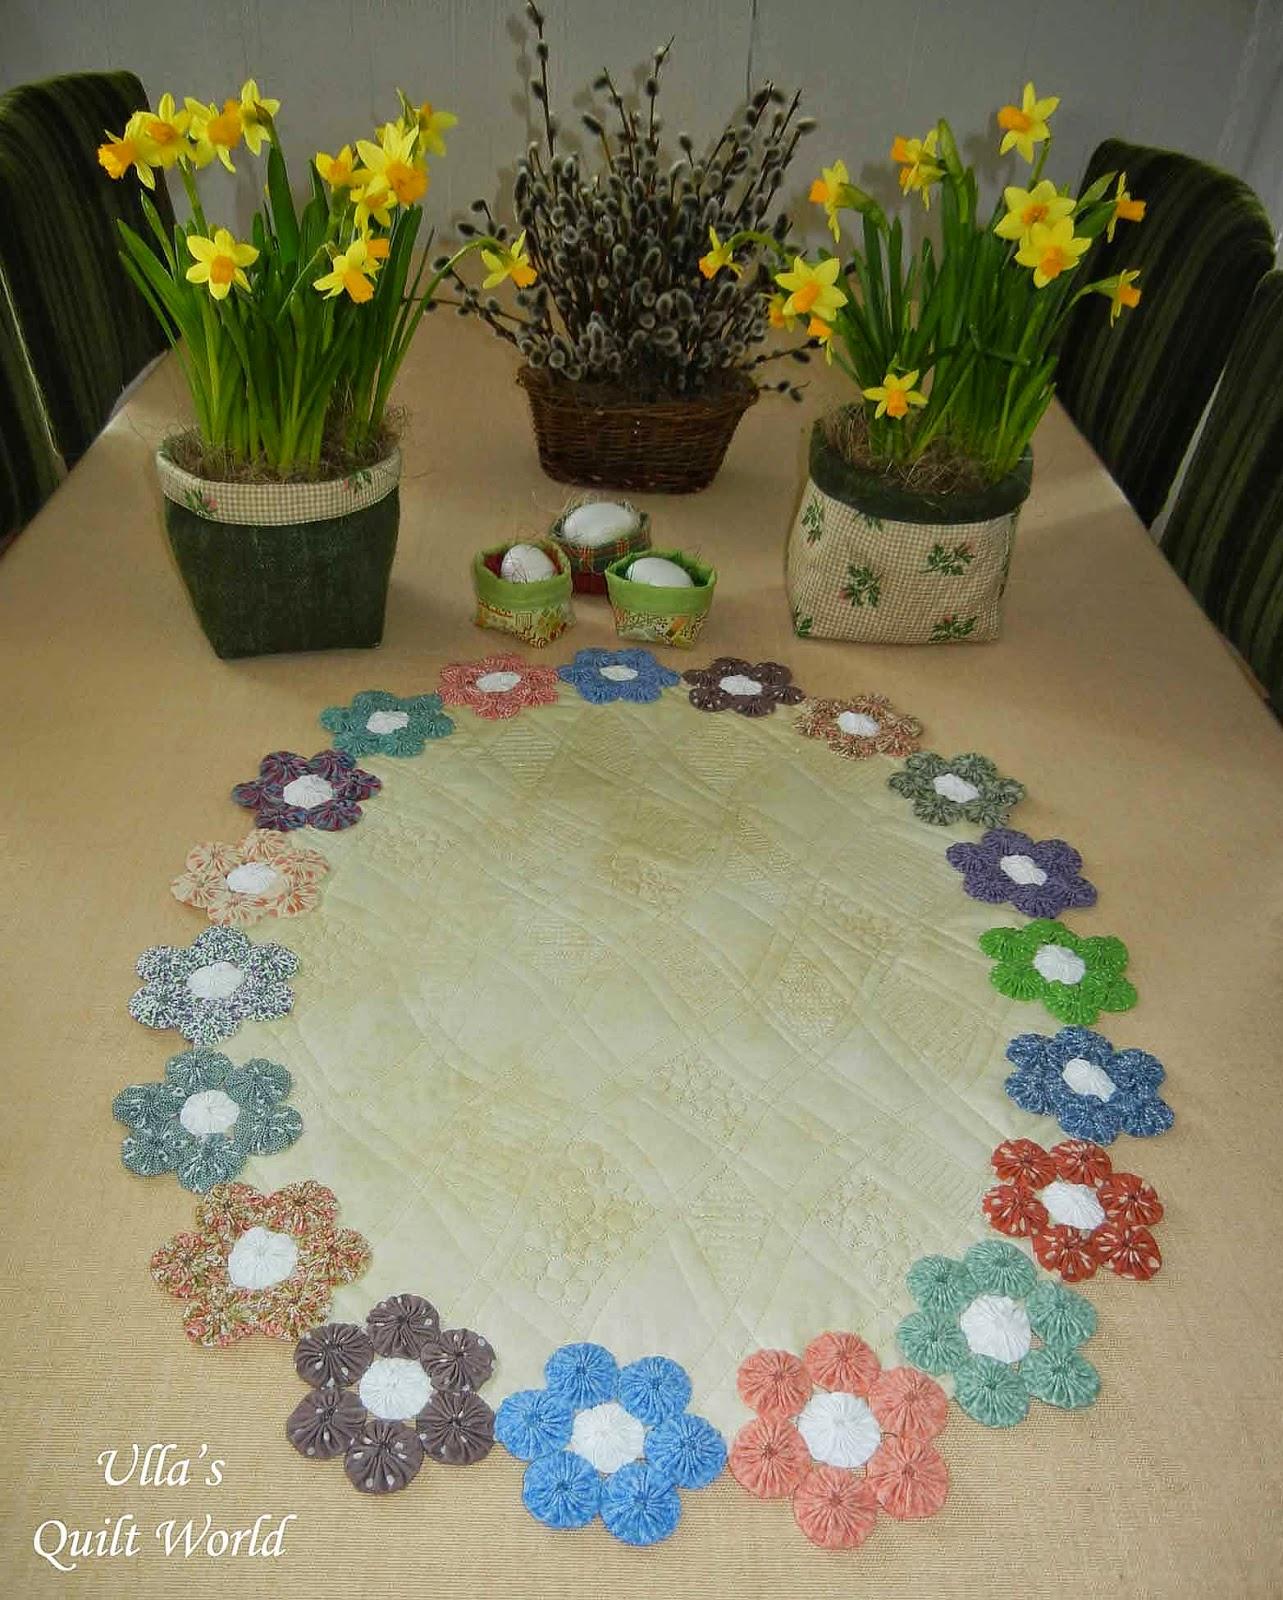 Applique designs for tablecloth - Yoyo Table Cloth Quilt